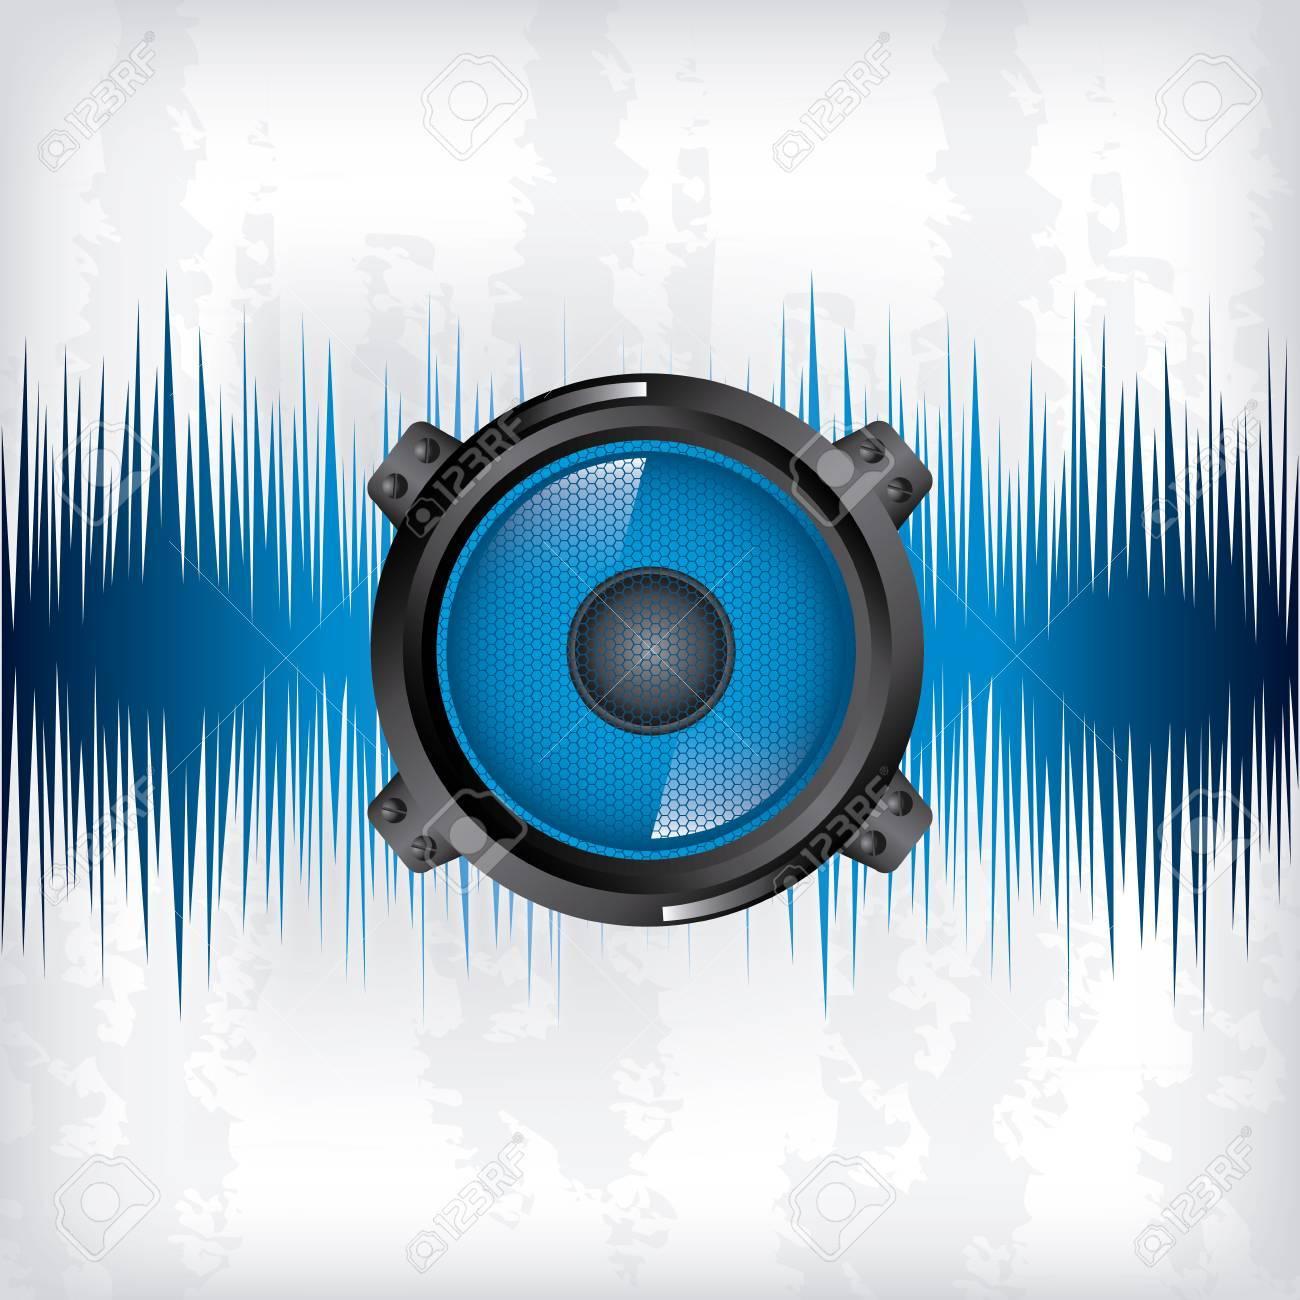 sound wave design over gray background vector illustration Stock Vector - 20108002